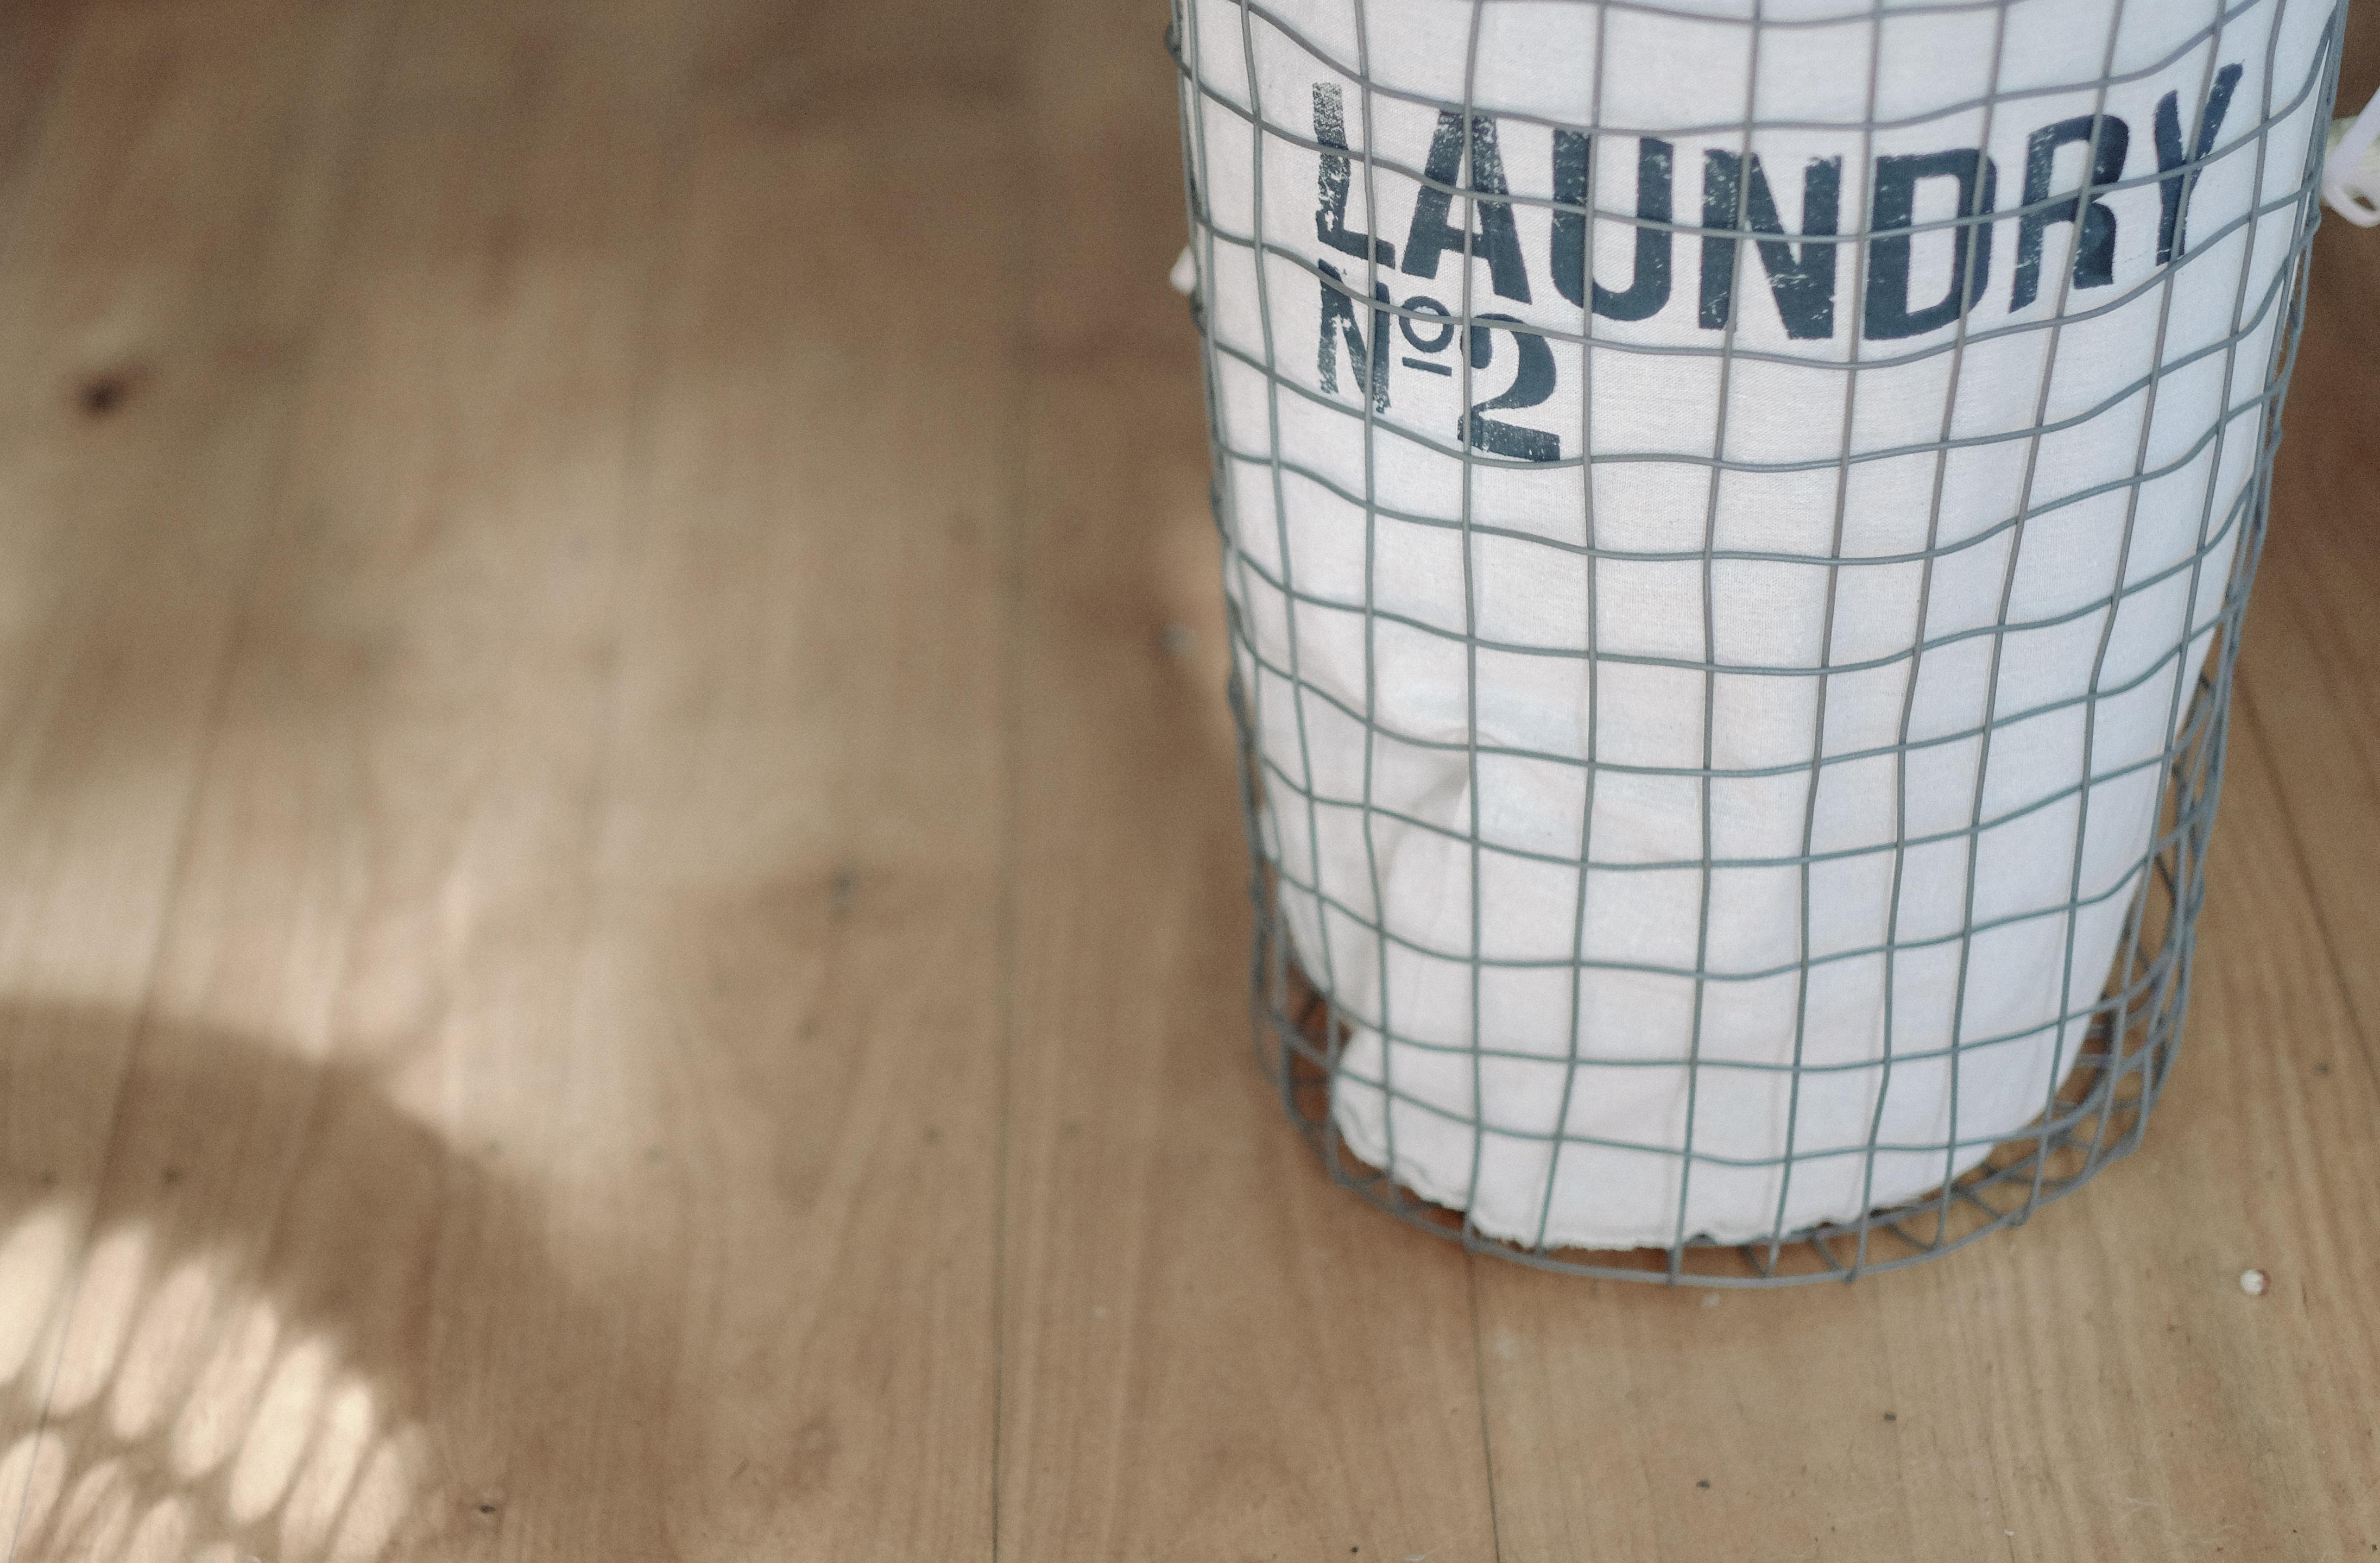 Energy_Saving_Hacks_Start_at_your_dryer.jpg